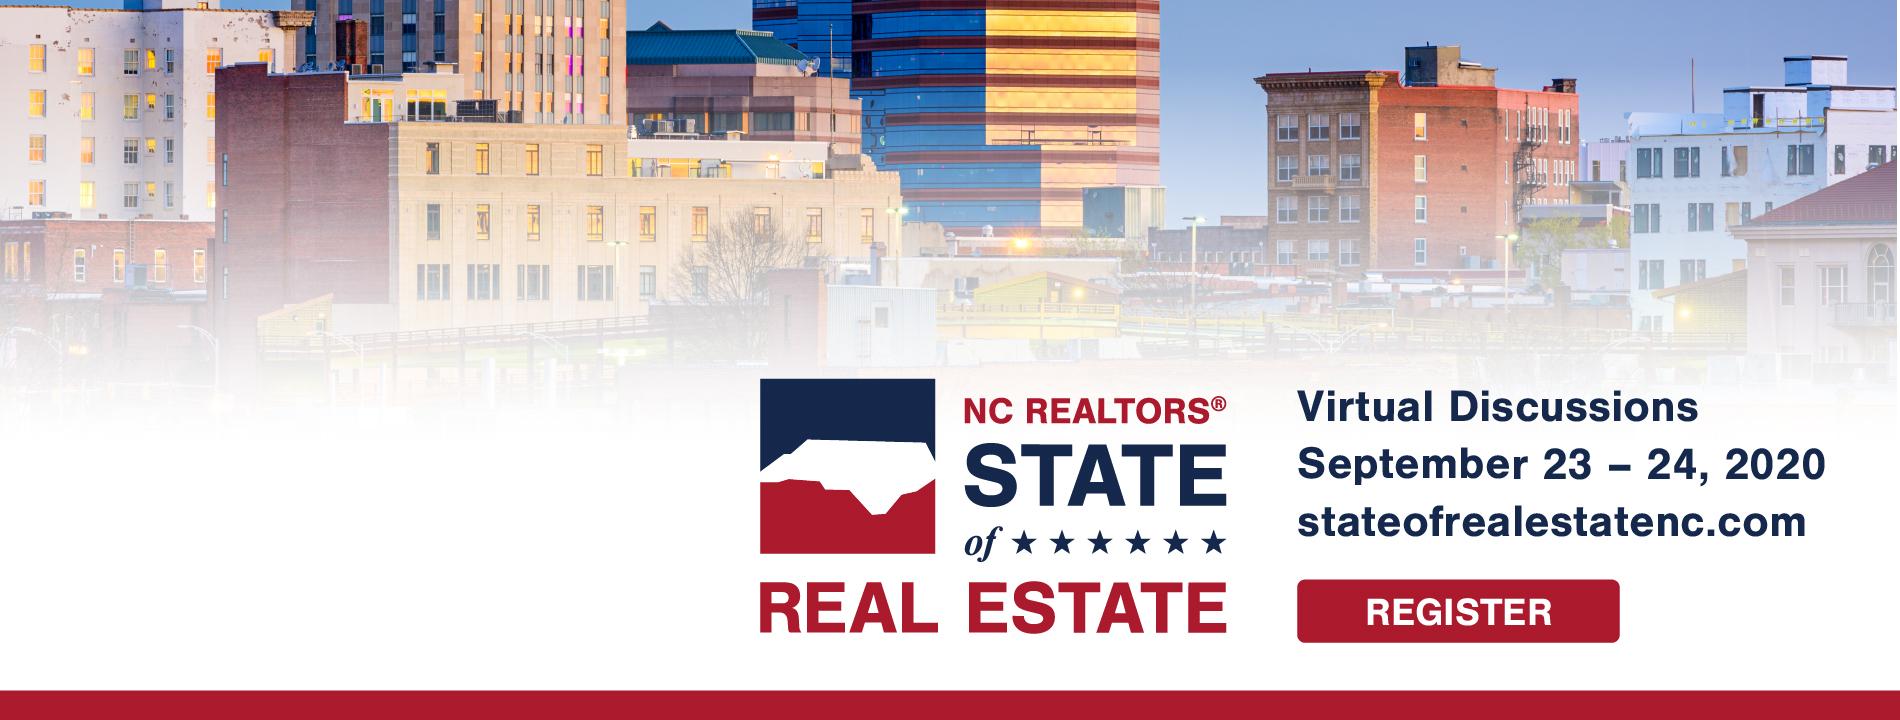 2020 State of Rea lEstate Virtual Website Slider